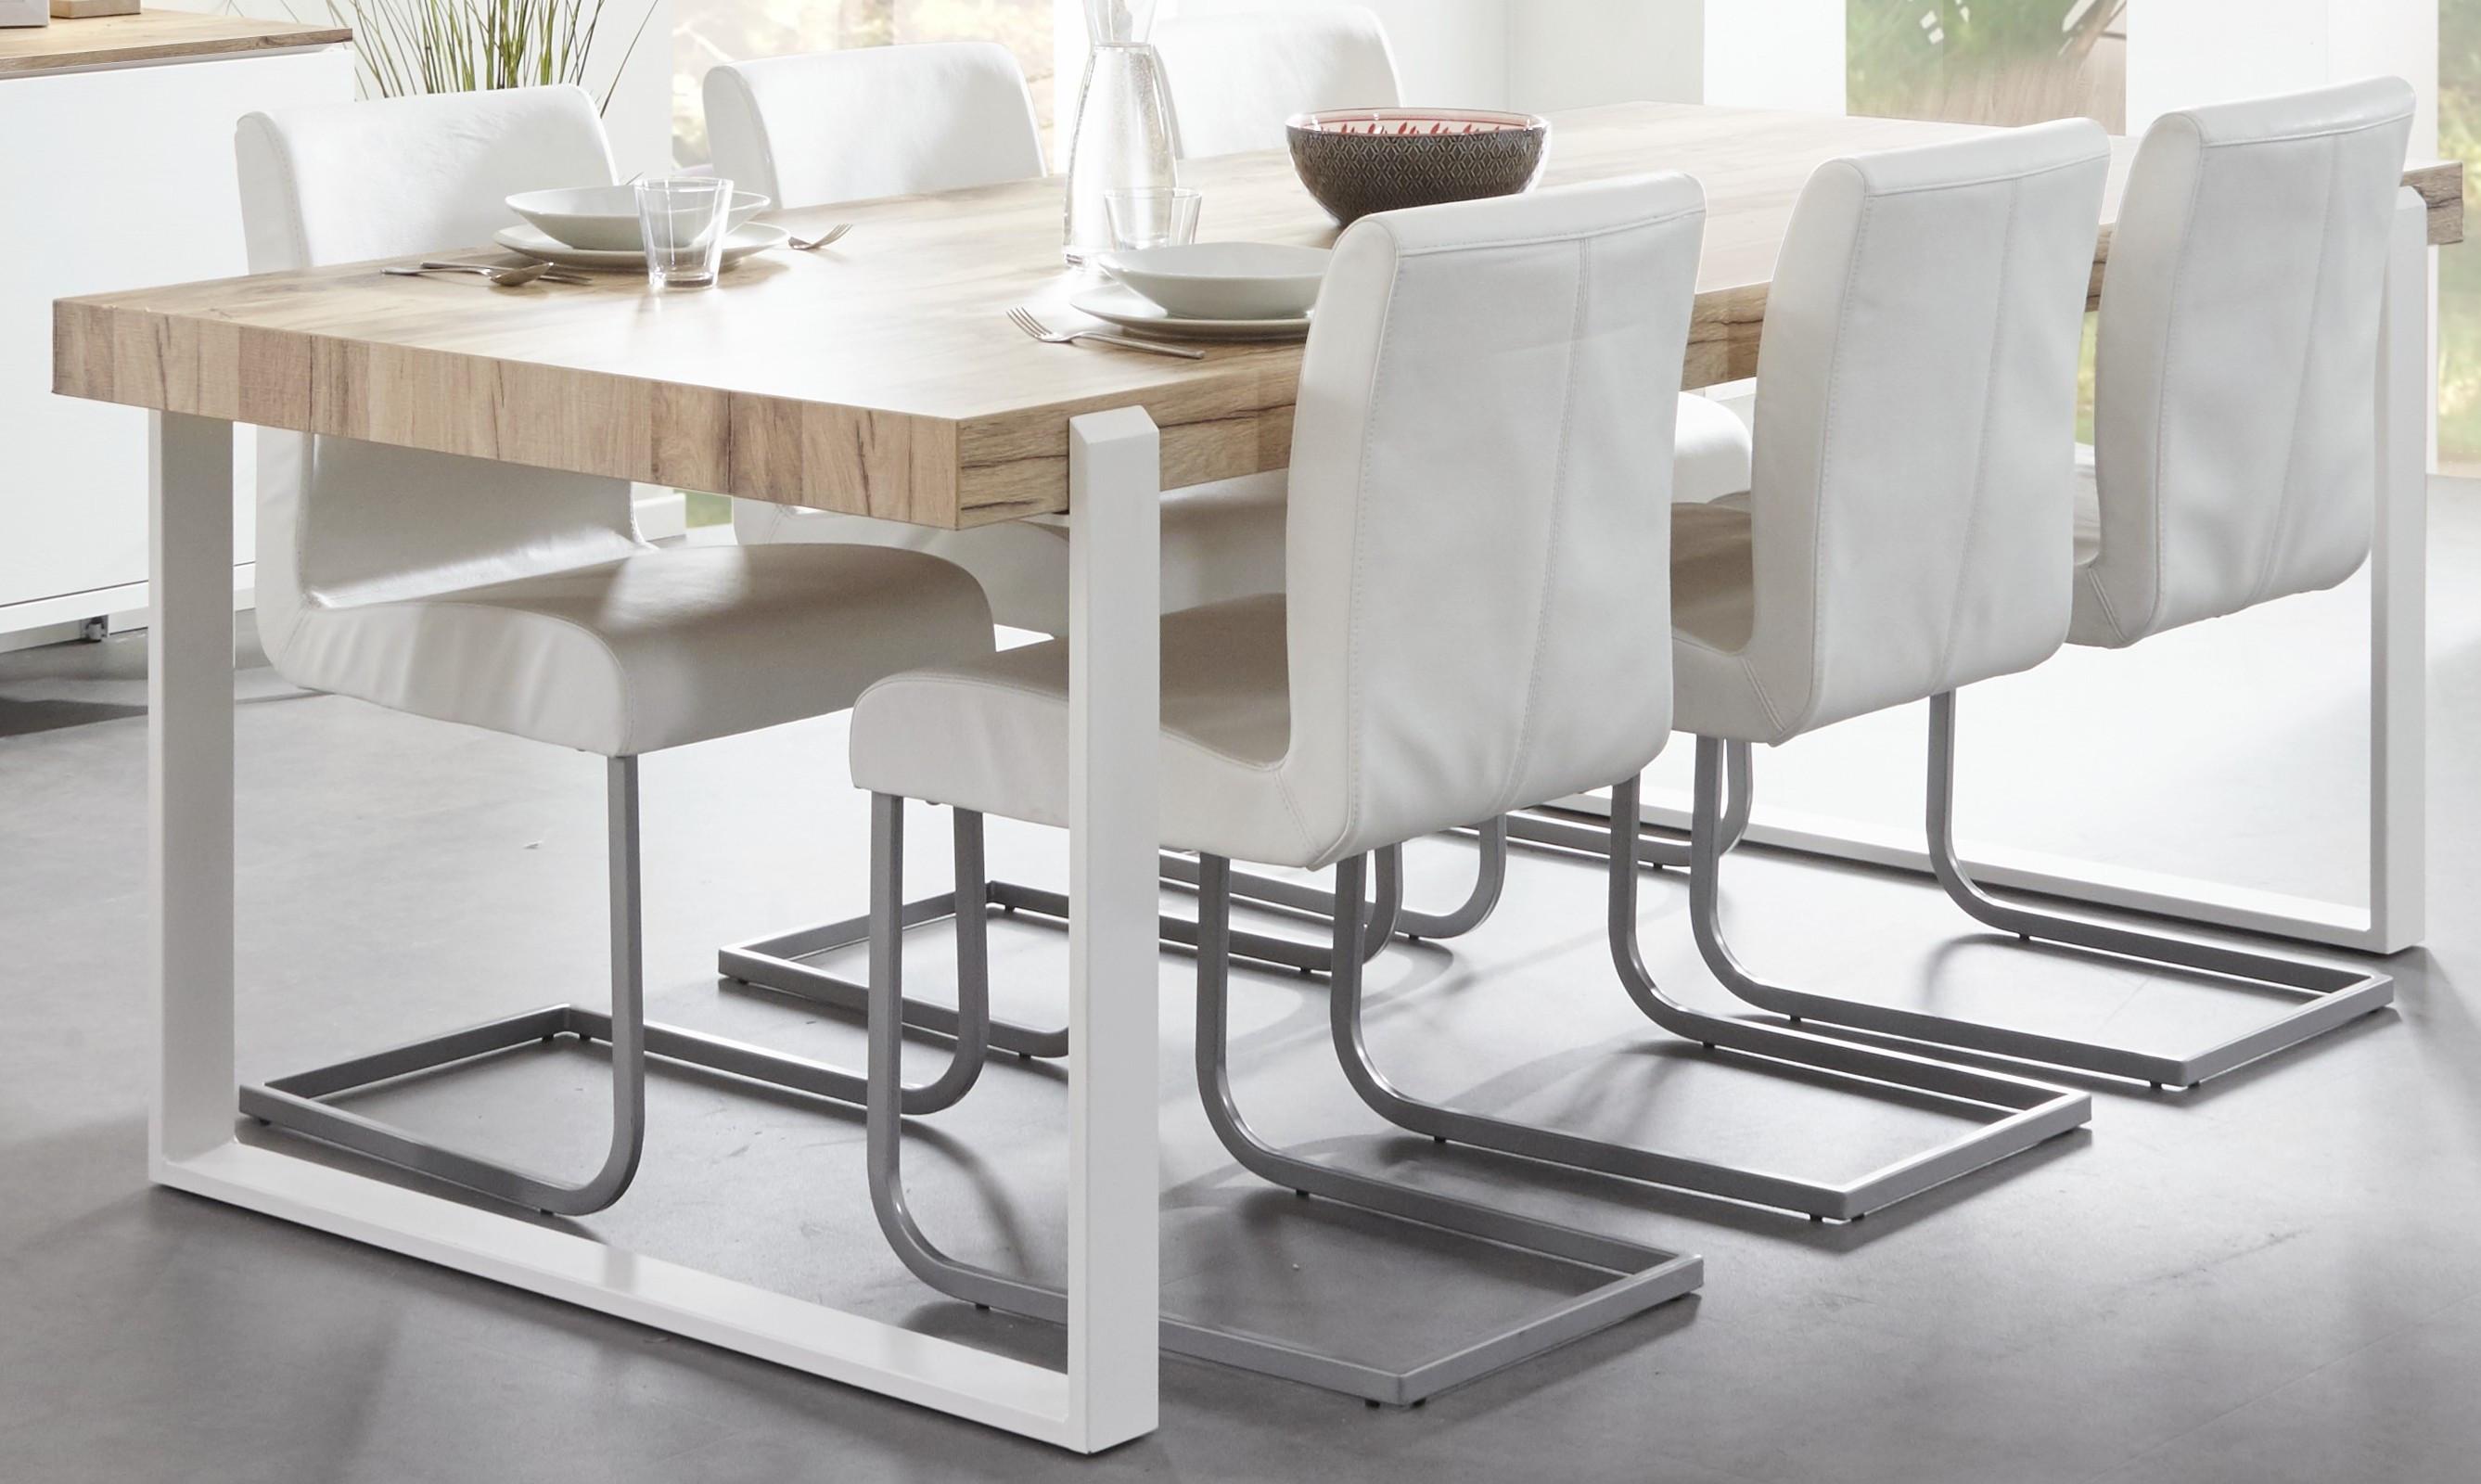 table salle a manger verano meubles belges evan